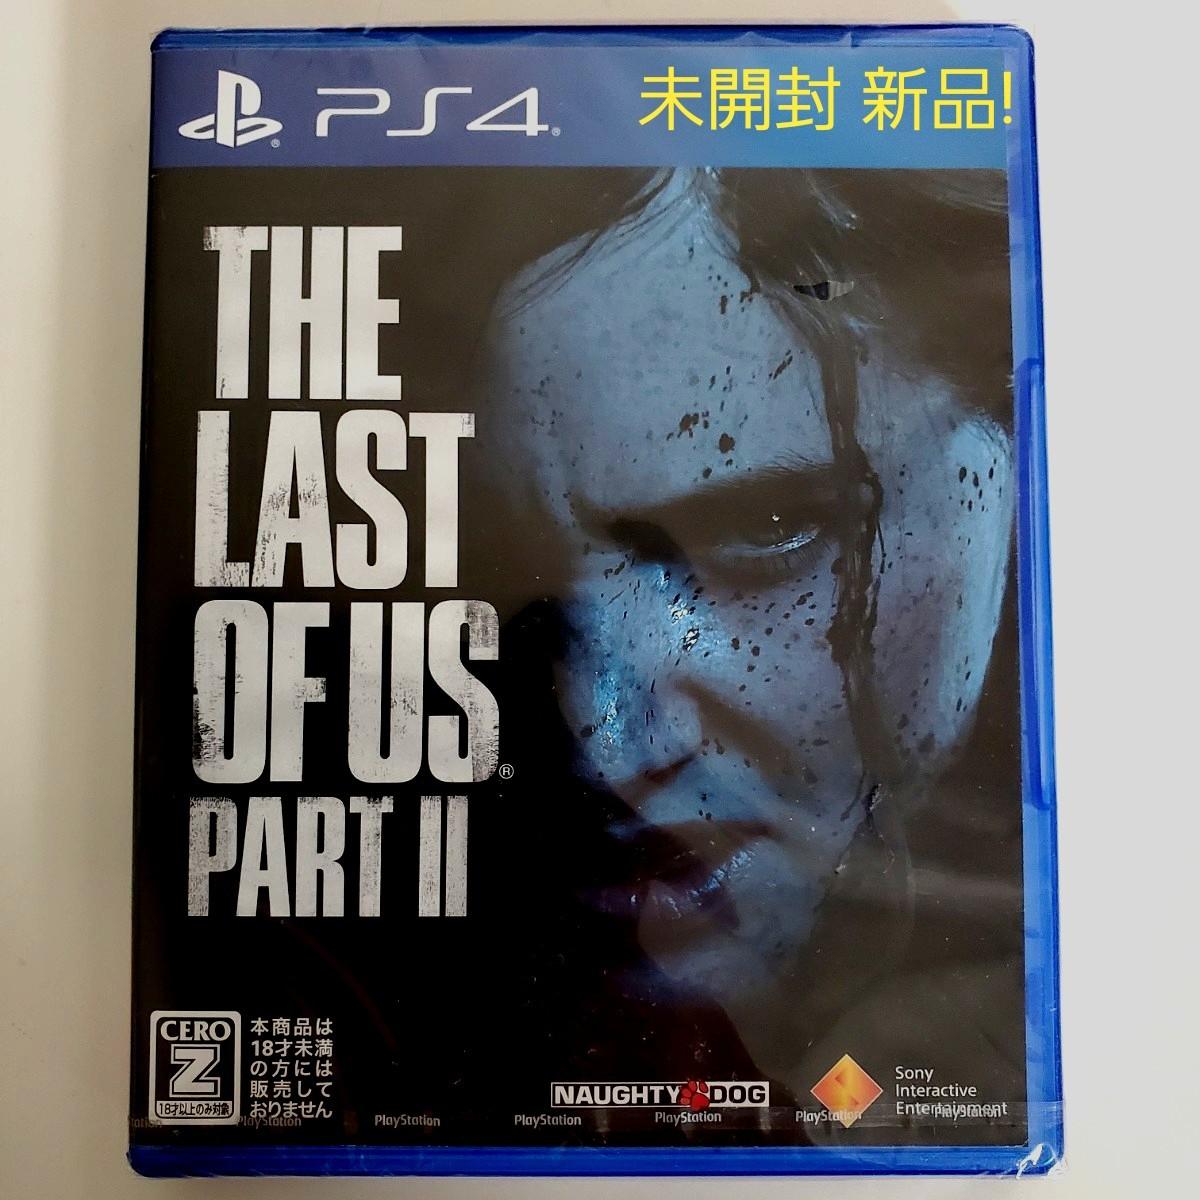 【PS4】 The Last of Us Part II [通常版] 新品 未開封 送料無料